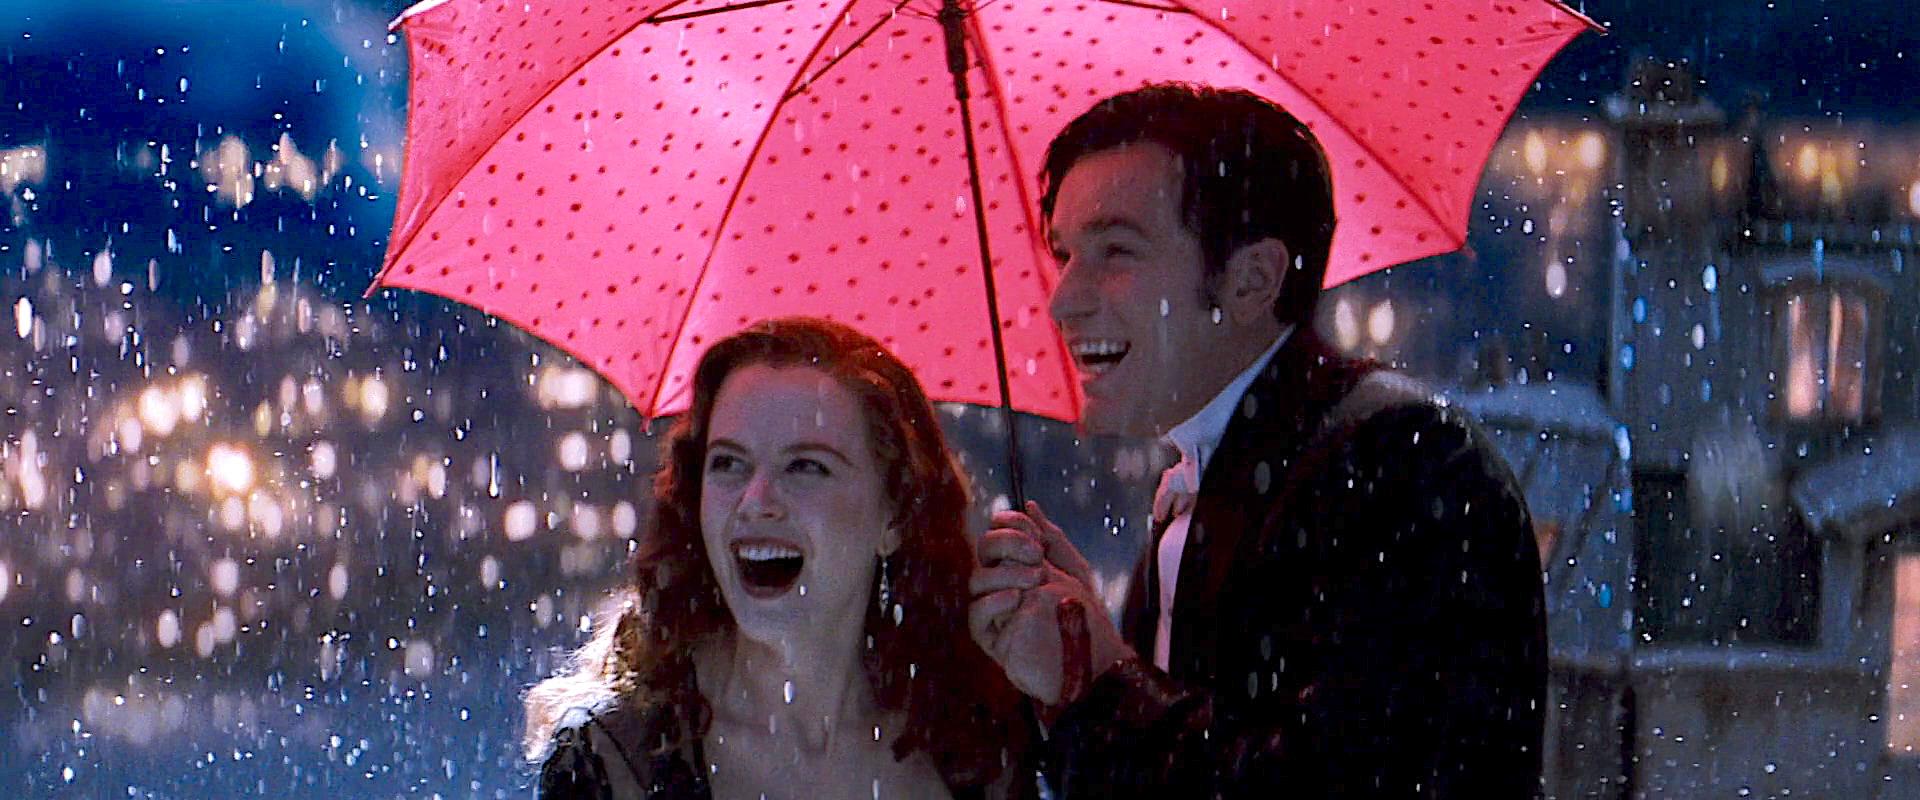 Nicole Kidman and Ewan McGregor under a pink umbrella together in Moulin Rouge